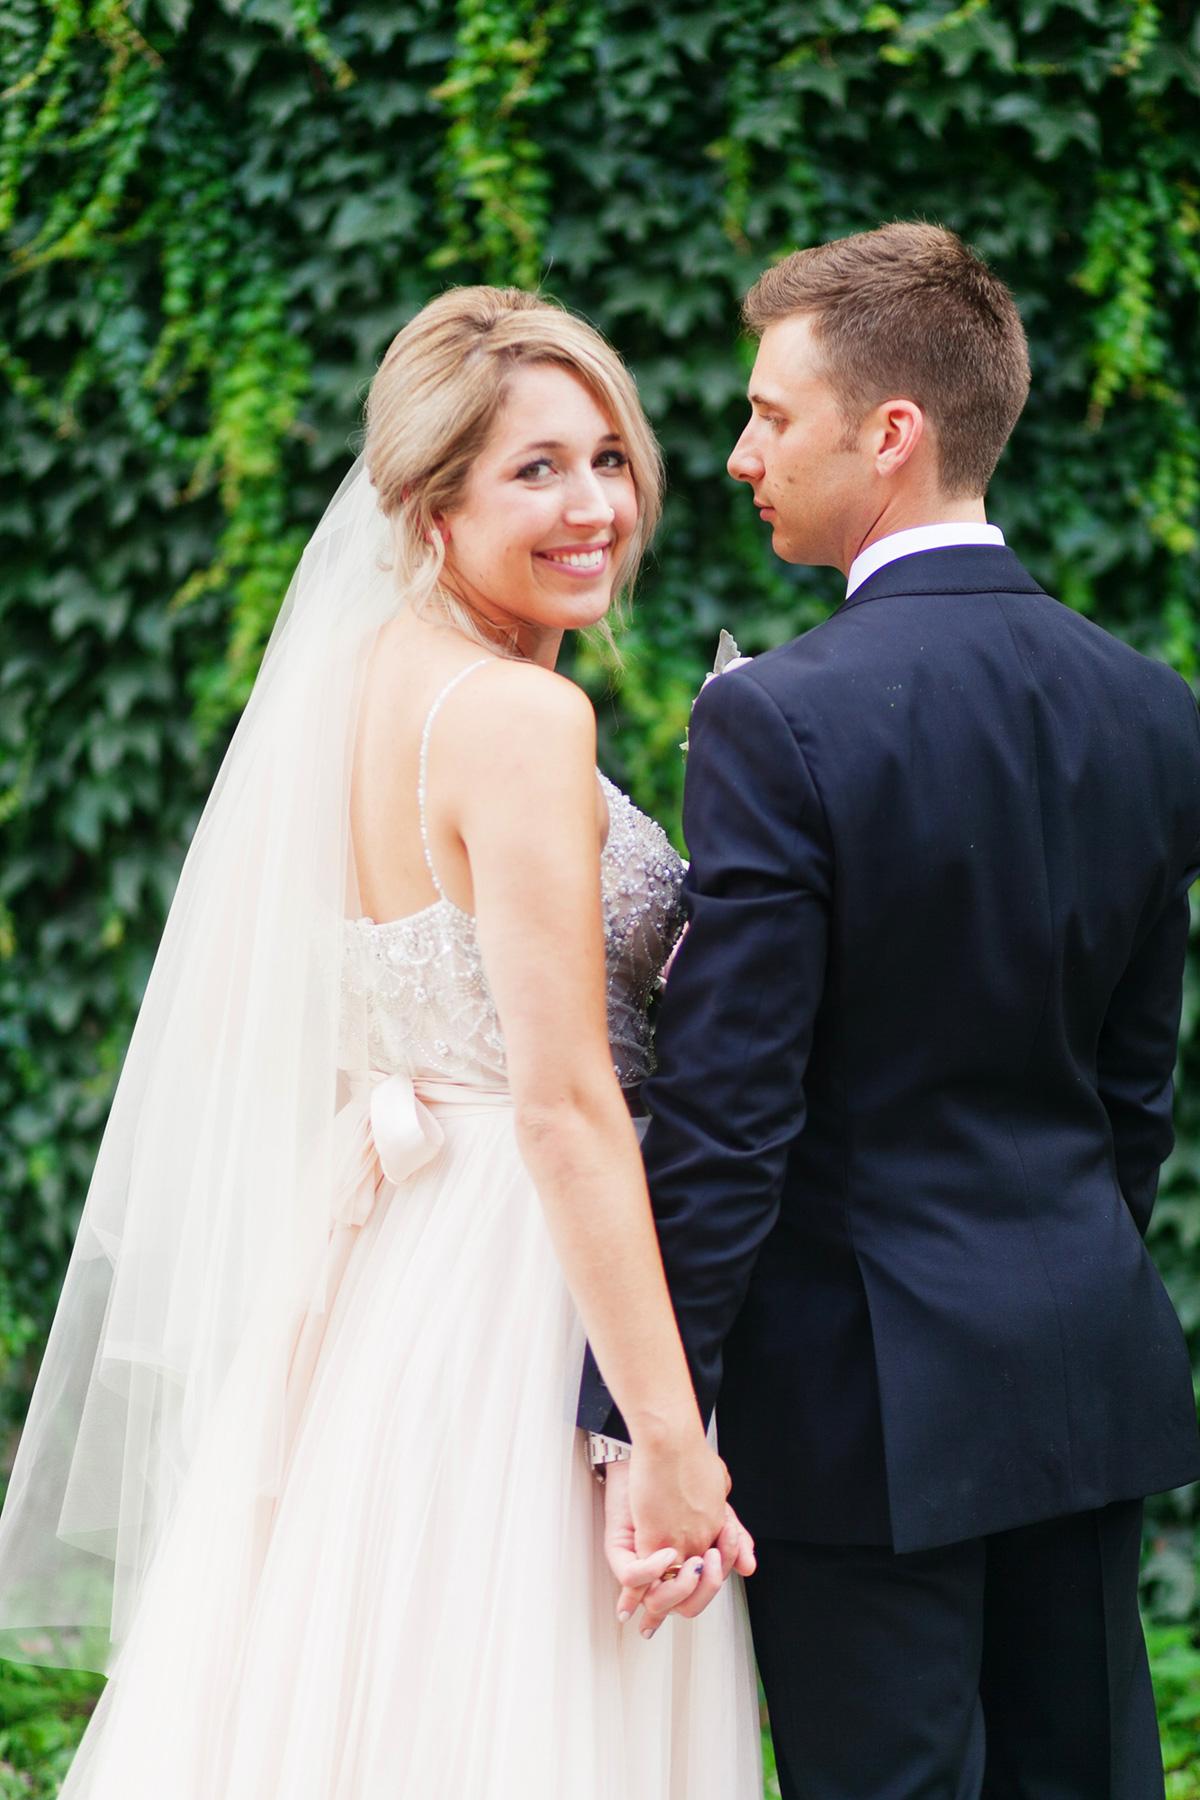 jennifer-xu-photography-vineyard-bride-swish-list-spice-factory-hamilton-wedding-4.jpg